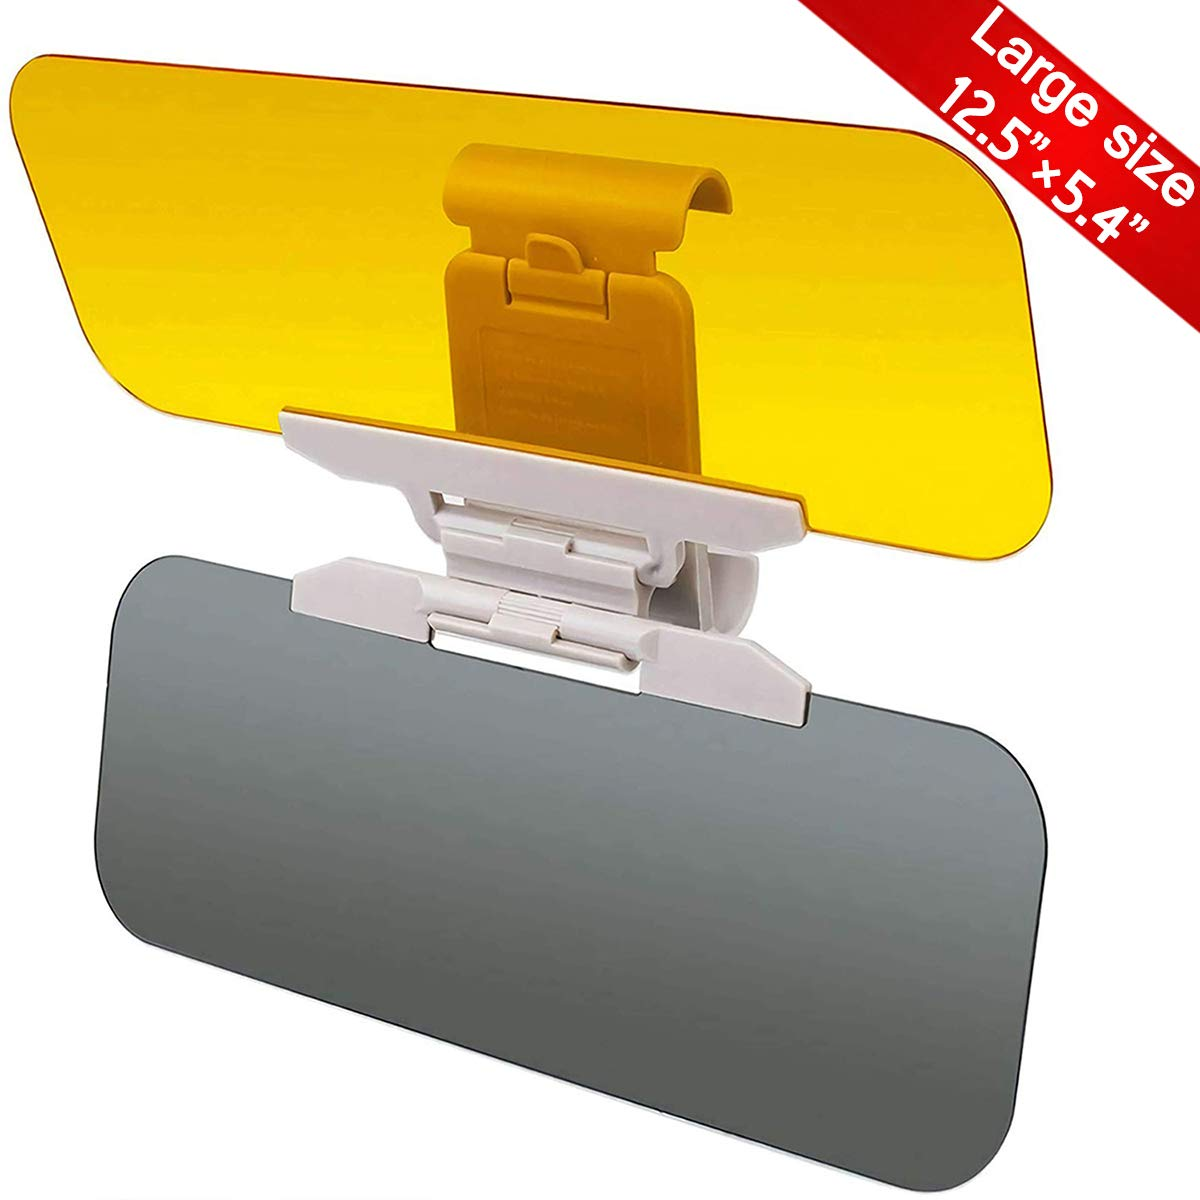 Yanztech Upgrade Car Sun Visor, Auto Windshield Anti-Glare Tac Visor, 2 in 1 Anti-Dazzle Day and Night Sun Visor Extender Mirror Vision, HD Sun Visor Protector for Car Windshield